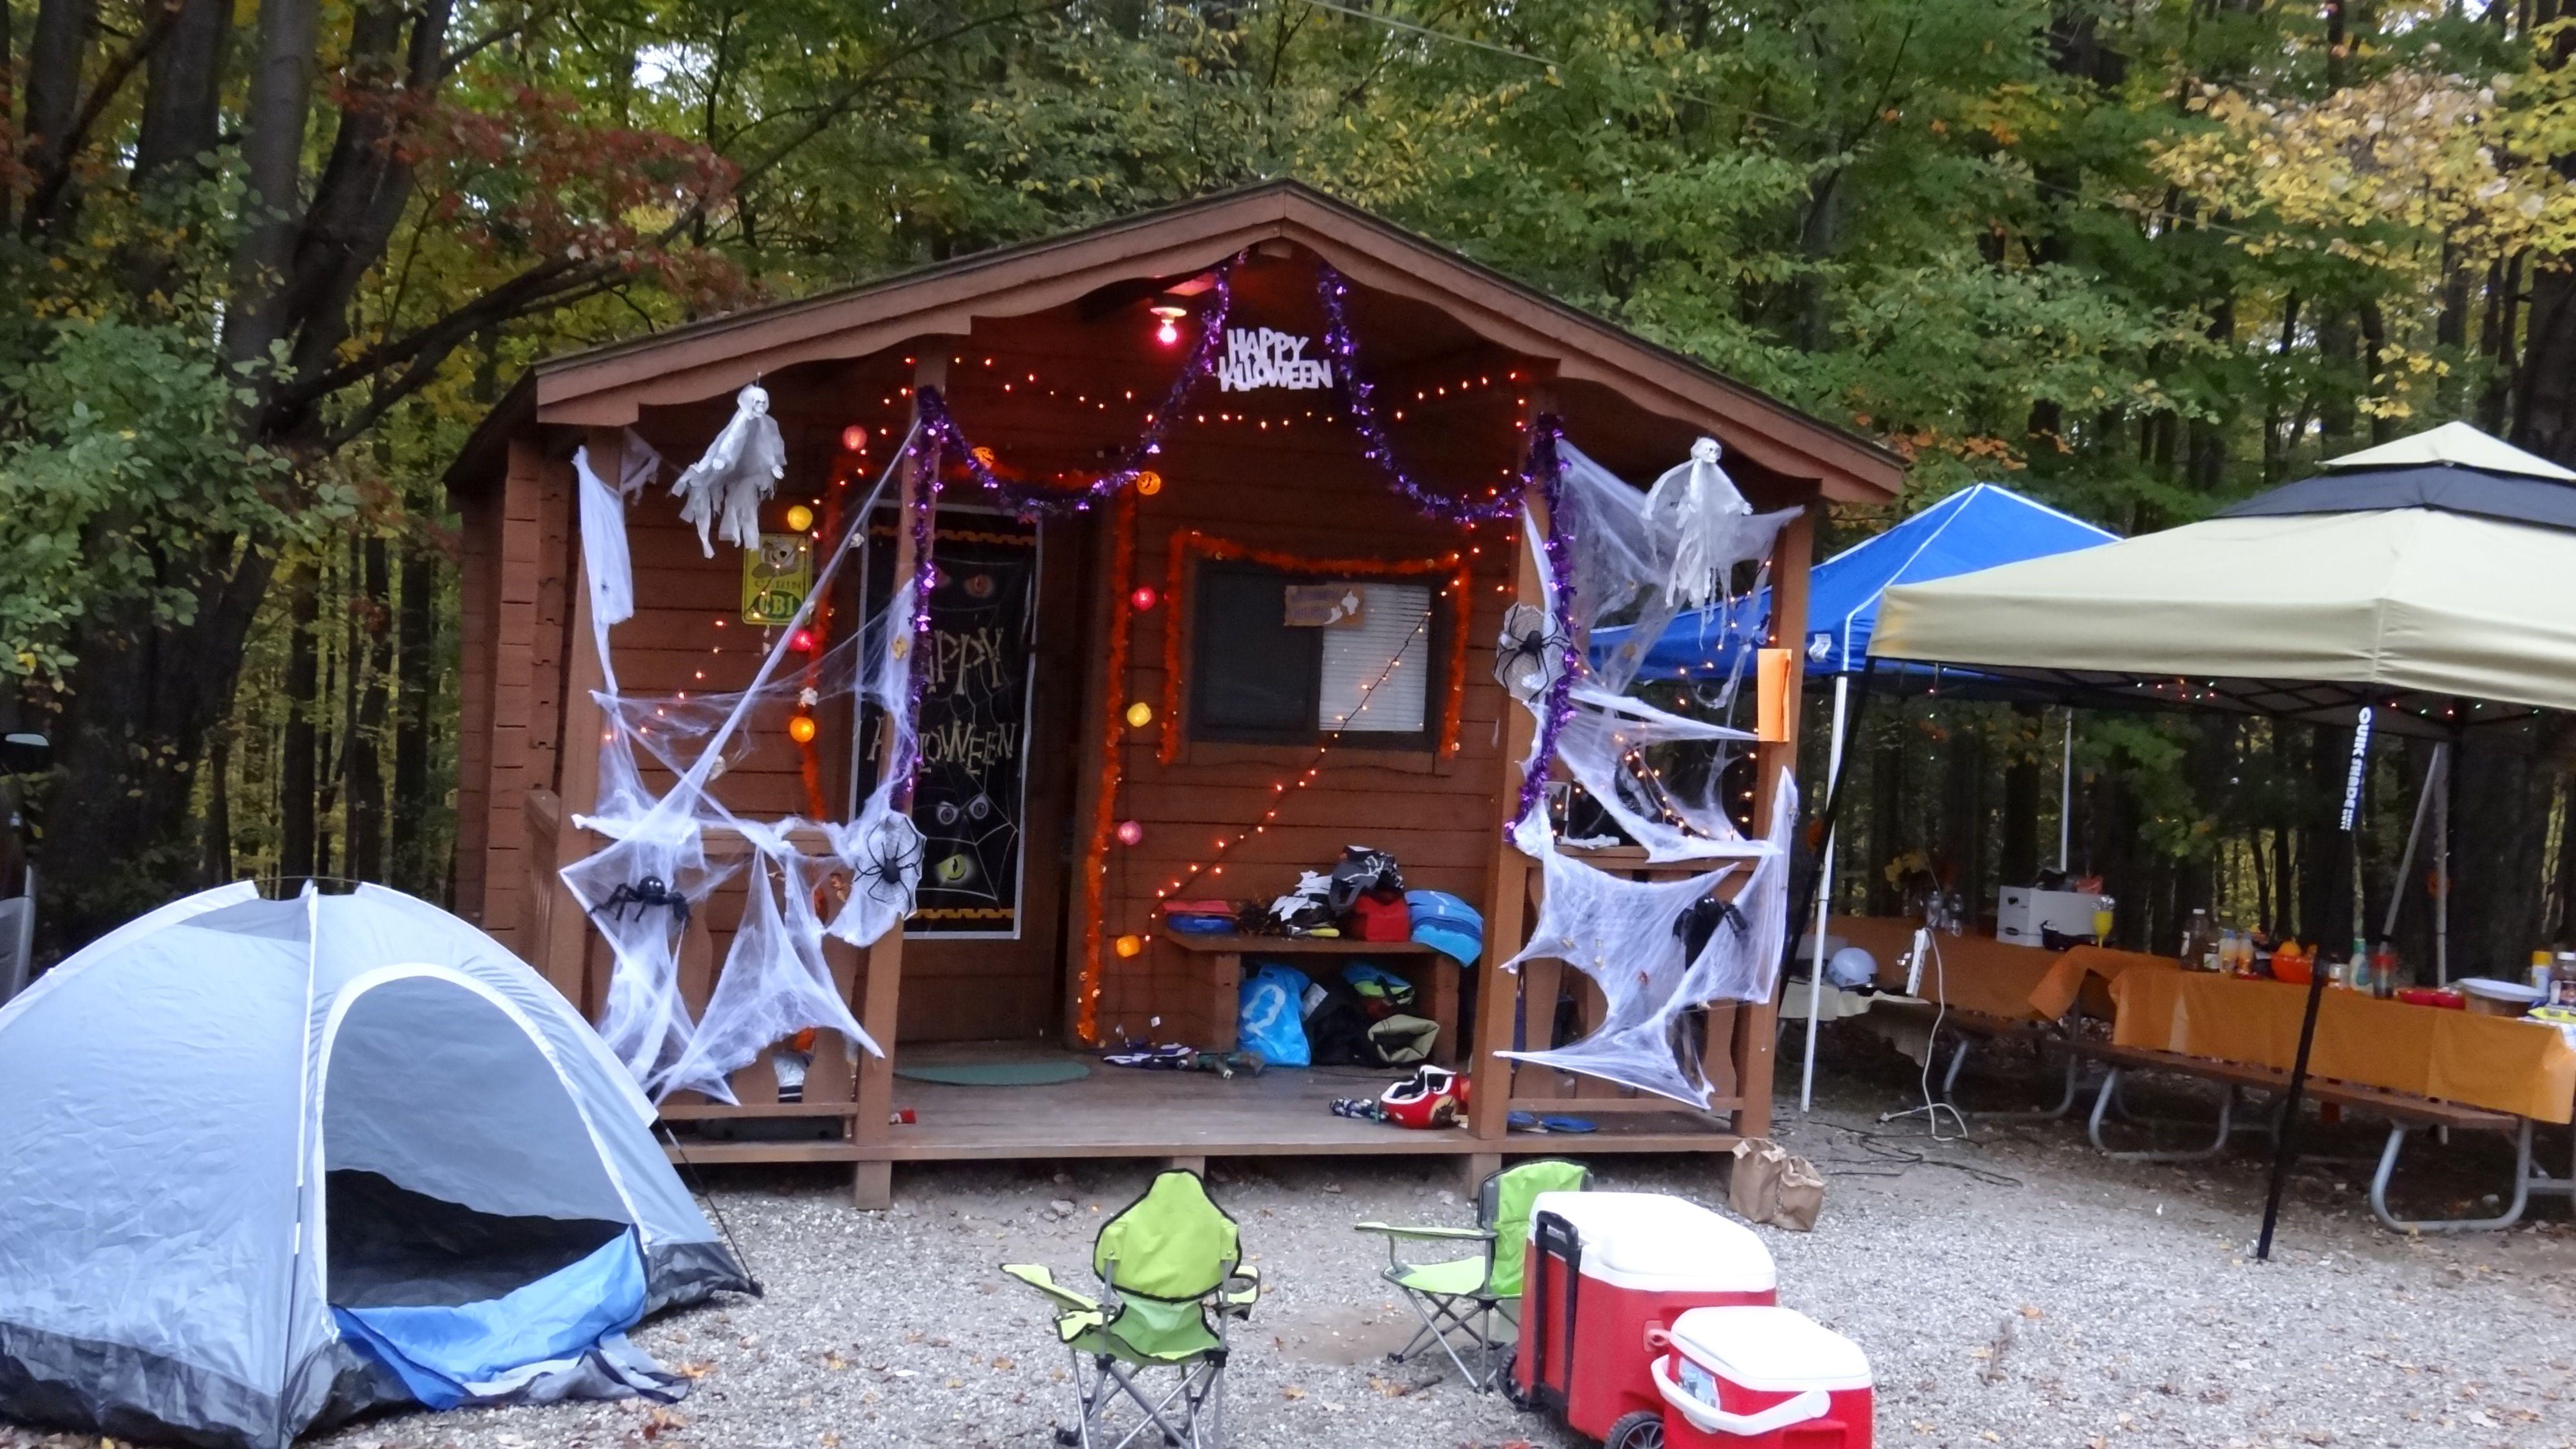 Halloween Cabin Decorating At Jellystone Park, Woodridge NY  Www.nyjellystone.com #Jellystone